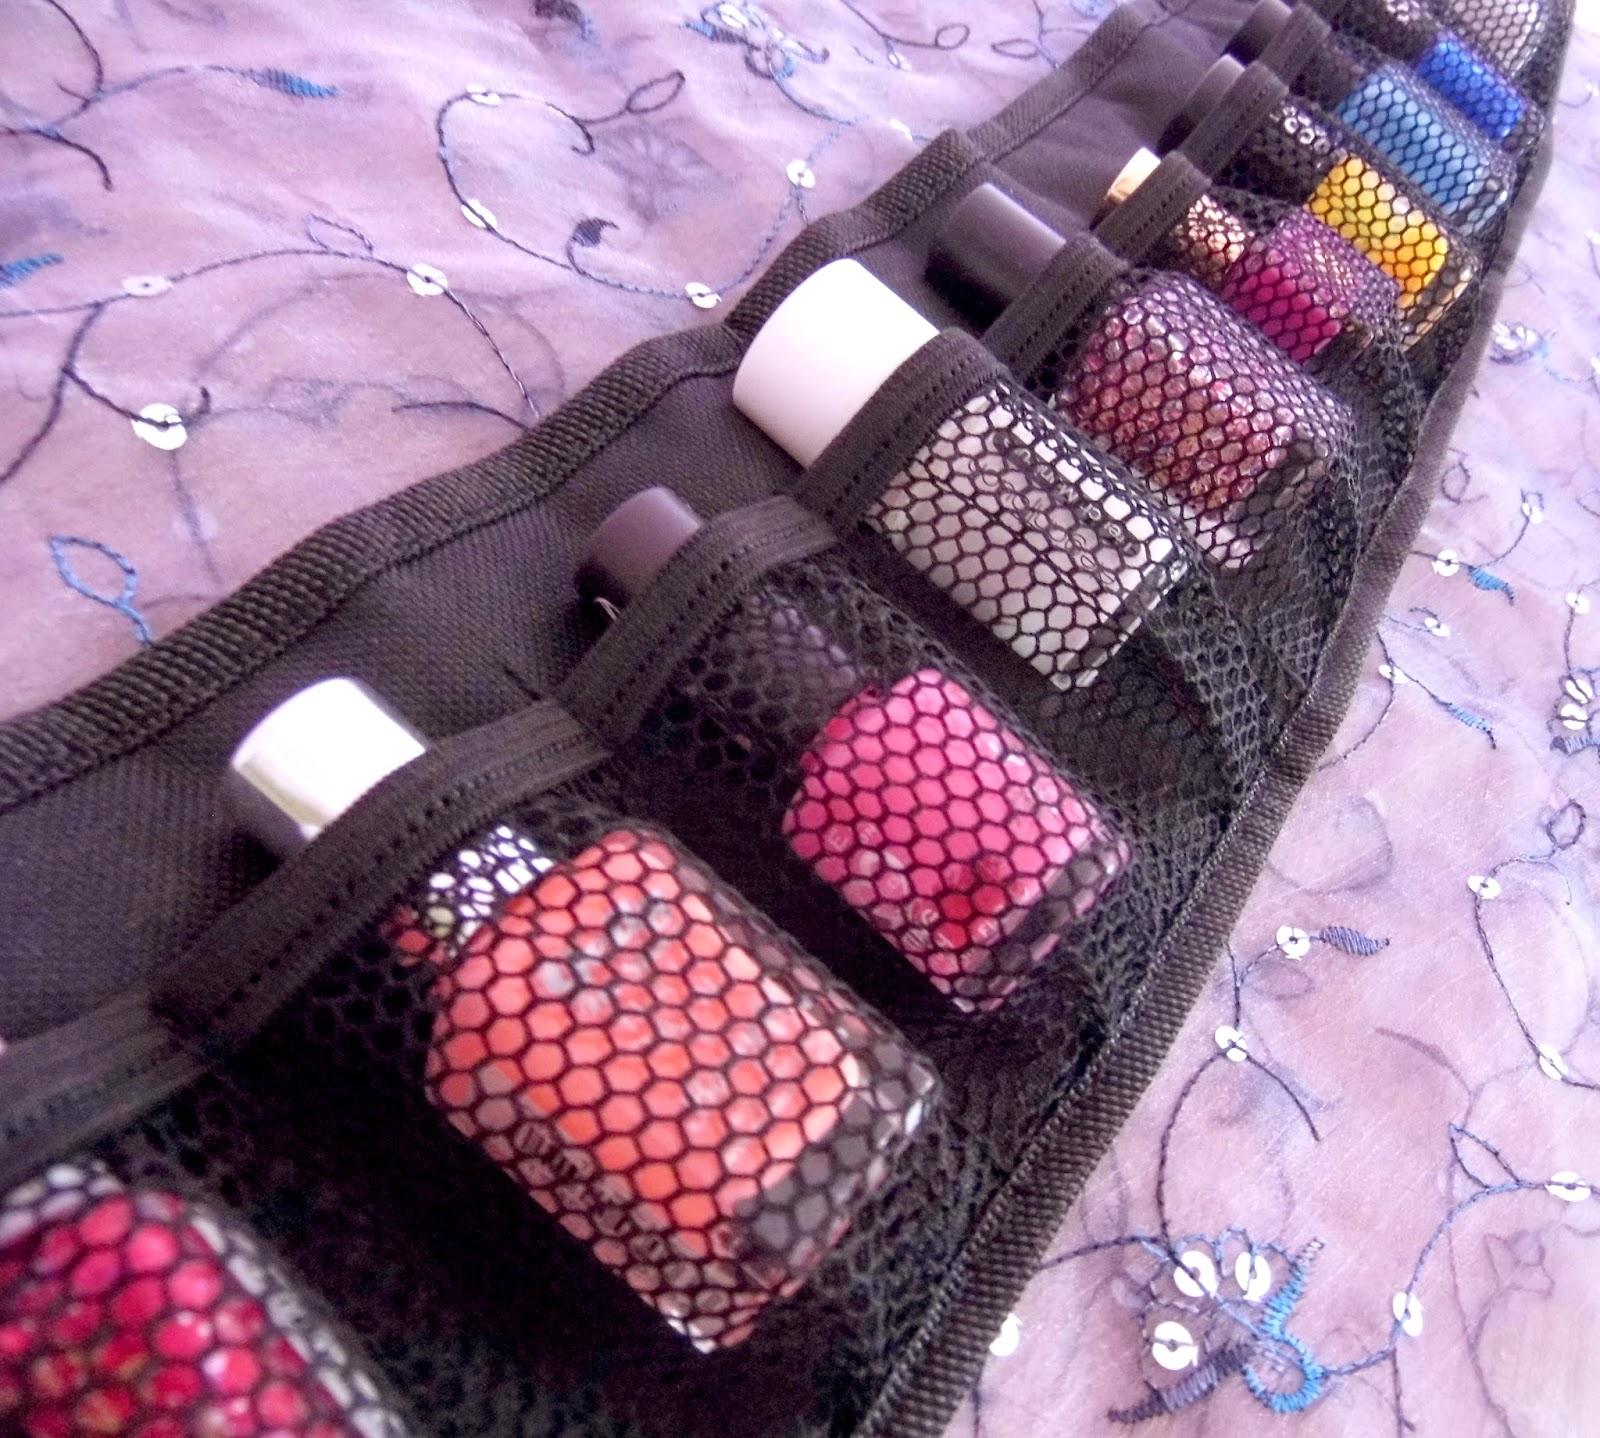 Roo Beauty Nail Polish Rolls | Nail Polish Storage